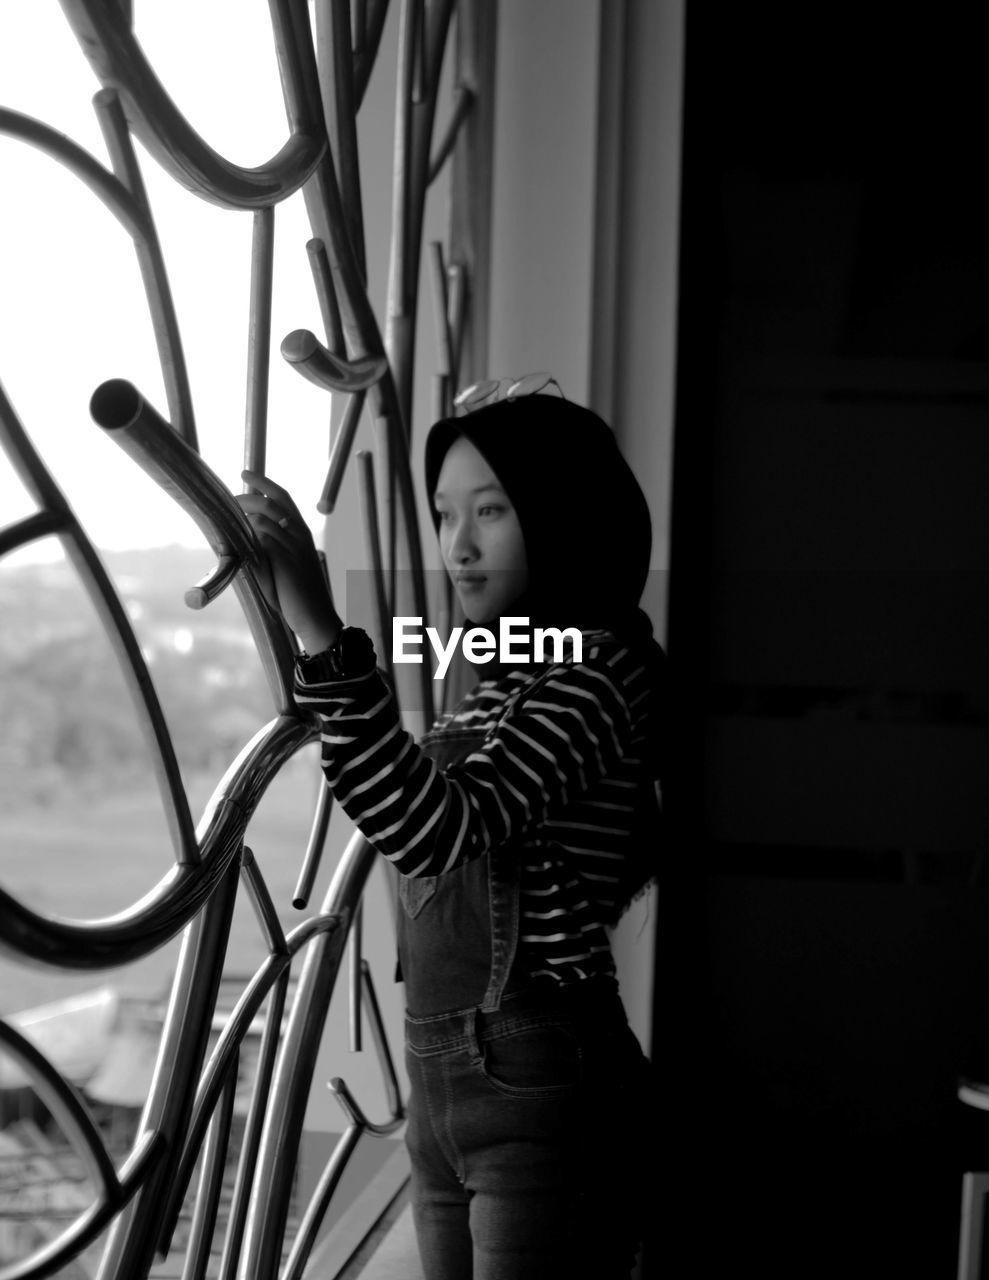 Teenage girl looking through window